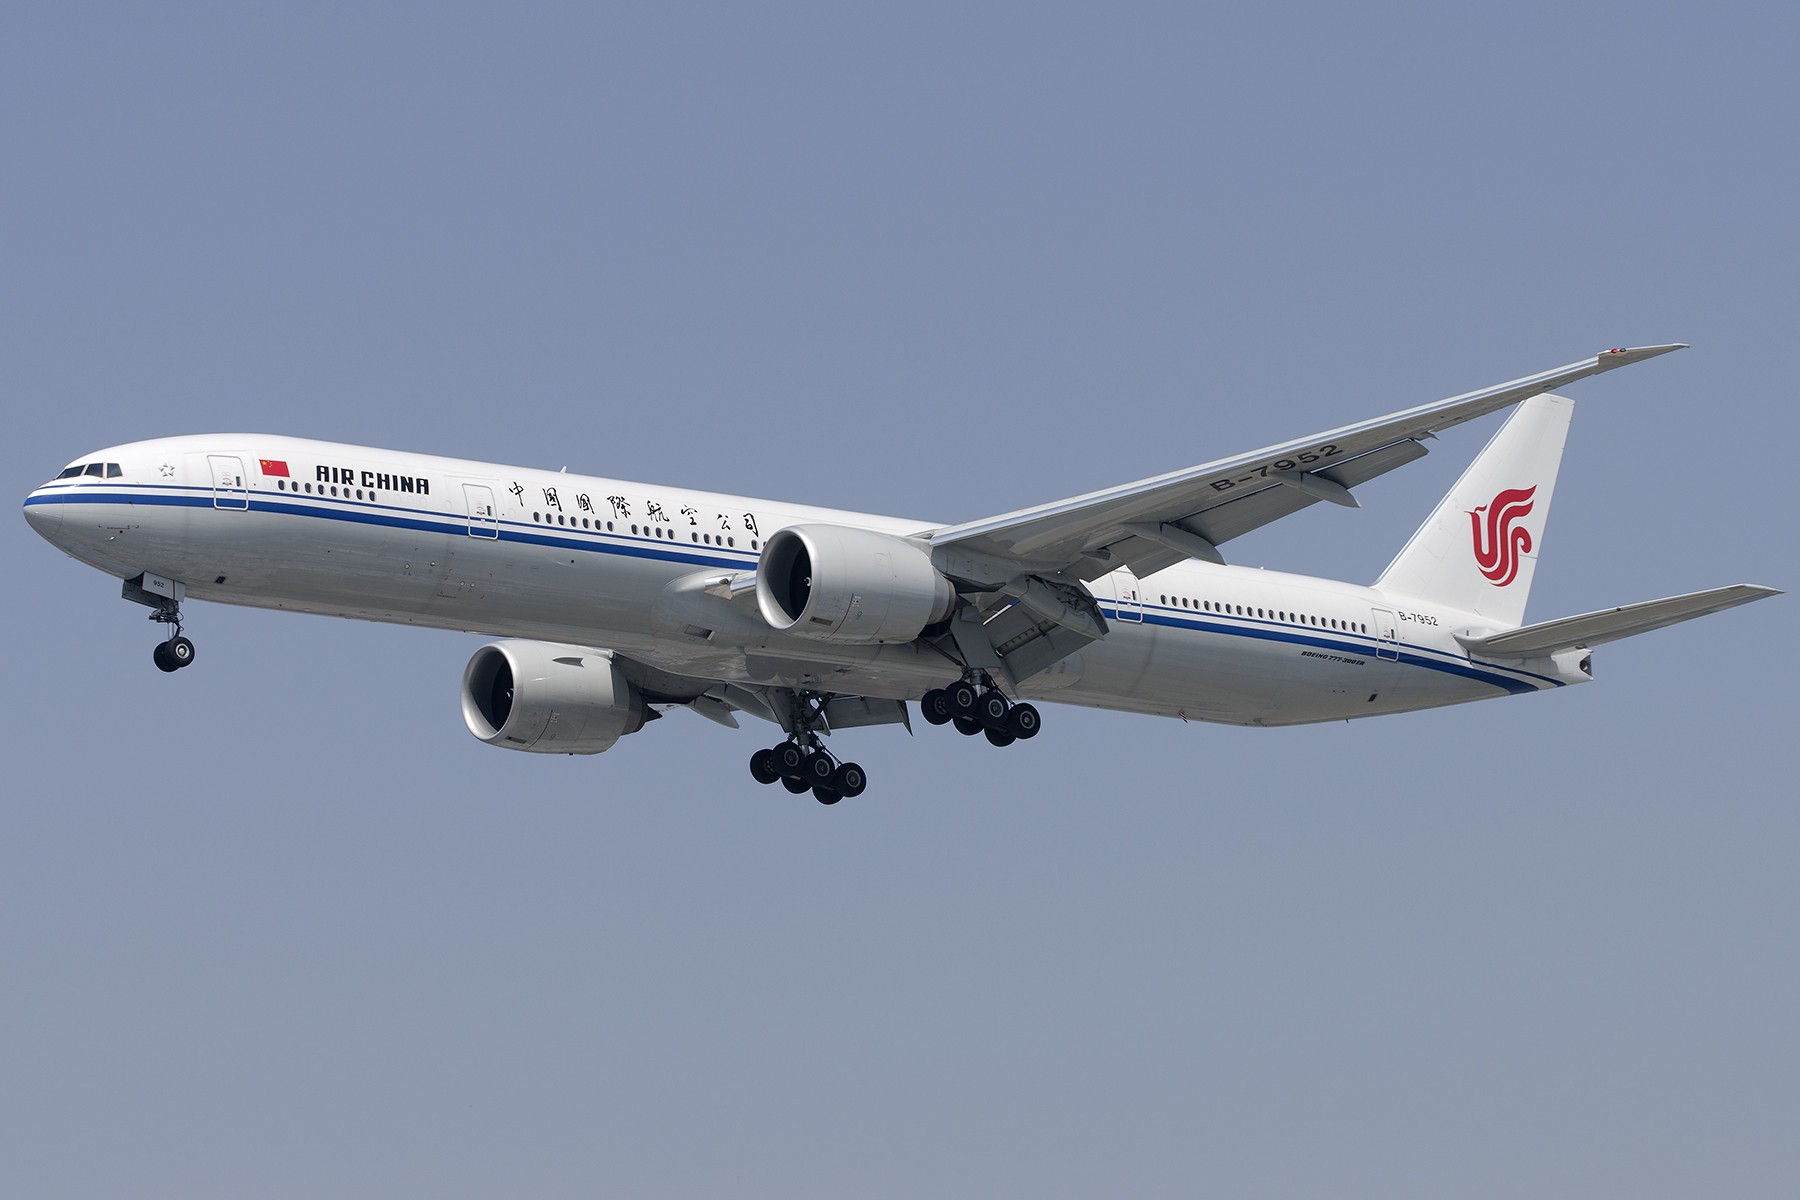 Re:[原创][原创]【SHA拍机*1800大图】4月拍的了,记得那天好货还挺多 BOEING 777-300ER B-7952 中国上海虹桥国际机场